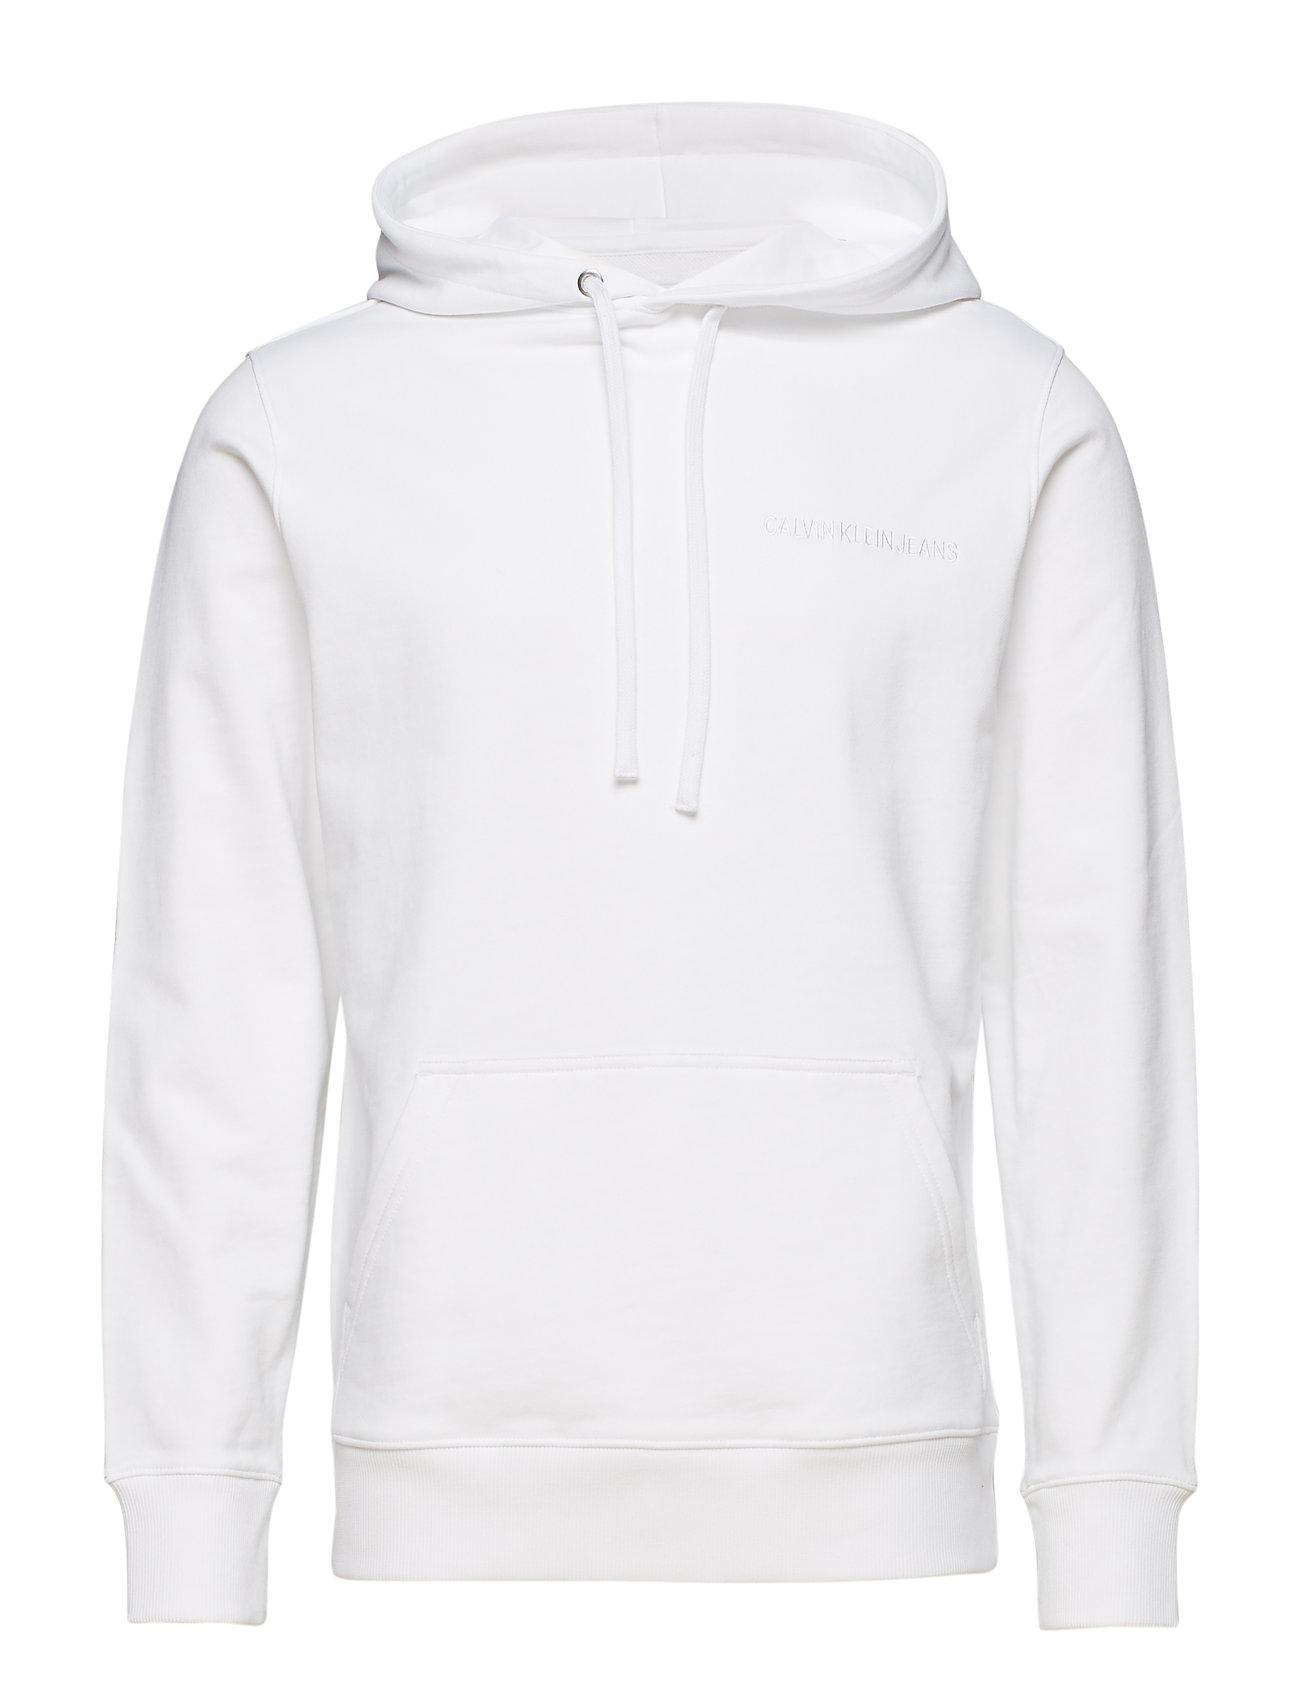 ck BlackCalvin Jeans White Institutional Back Lbright Klein XTOPkZiu